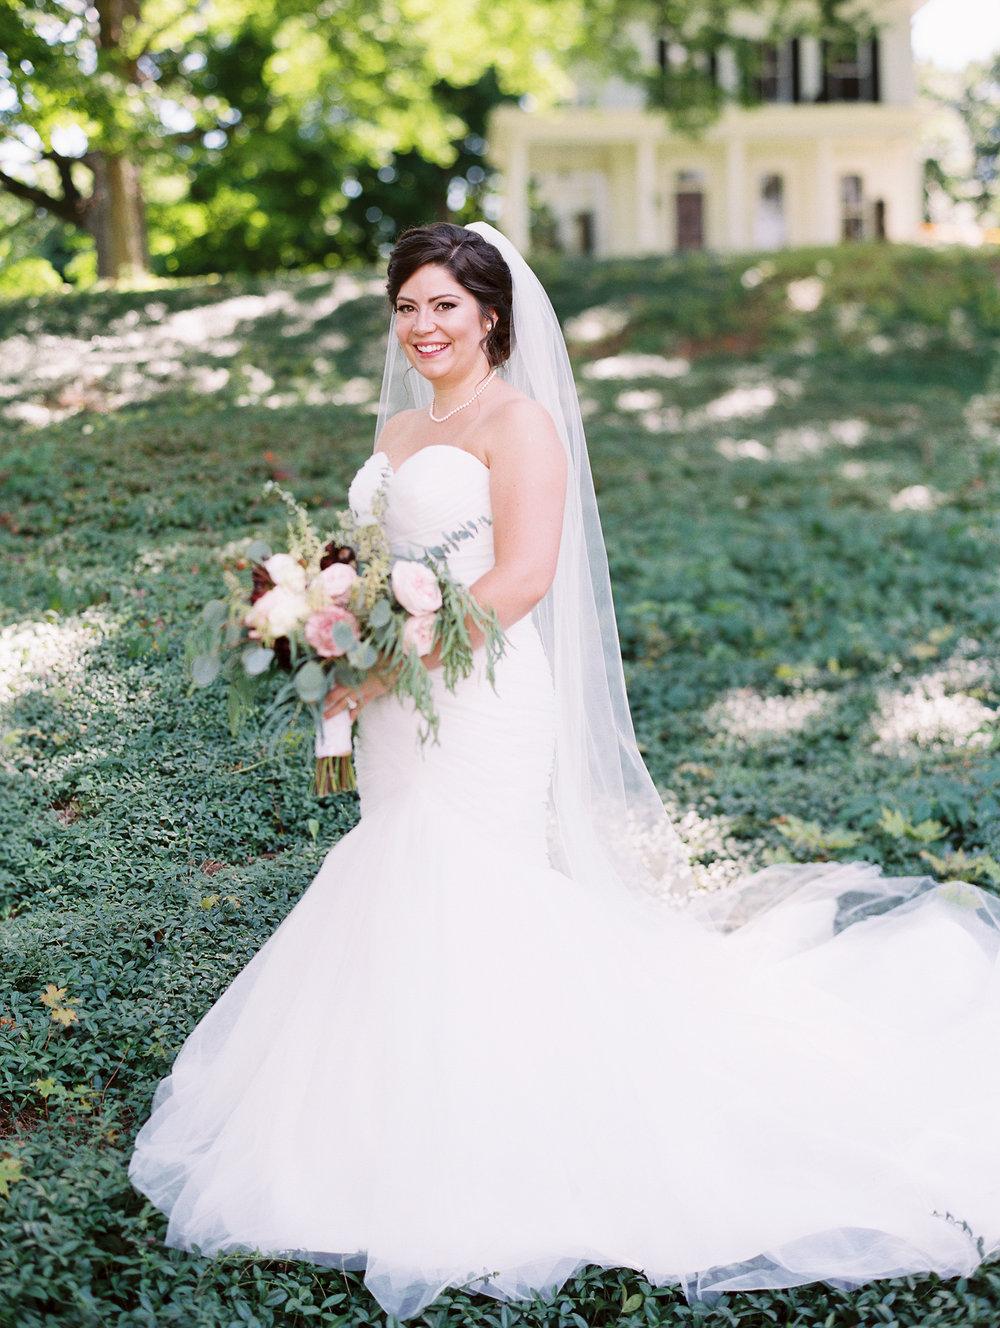 Sobania Wedding Bride Groom f ASP©-5.jpg